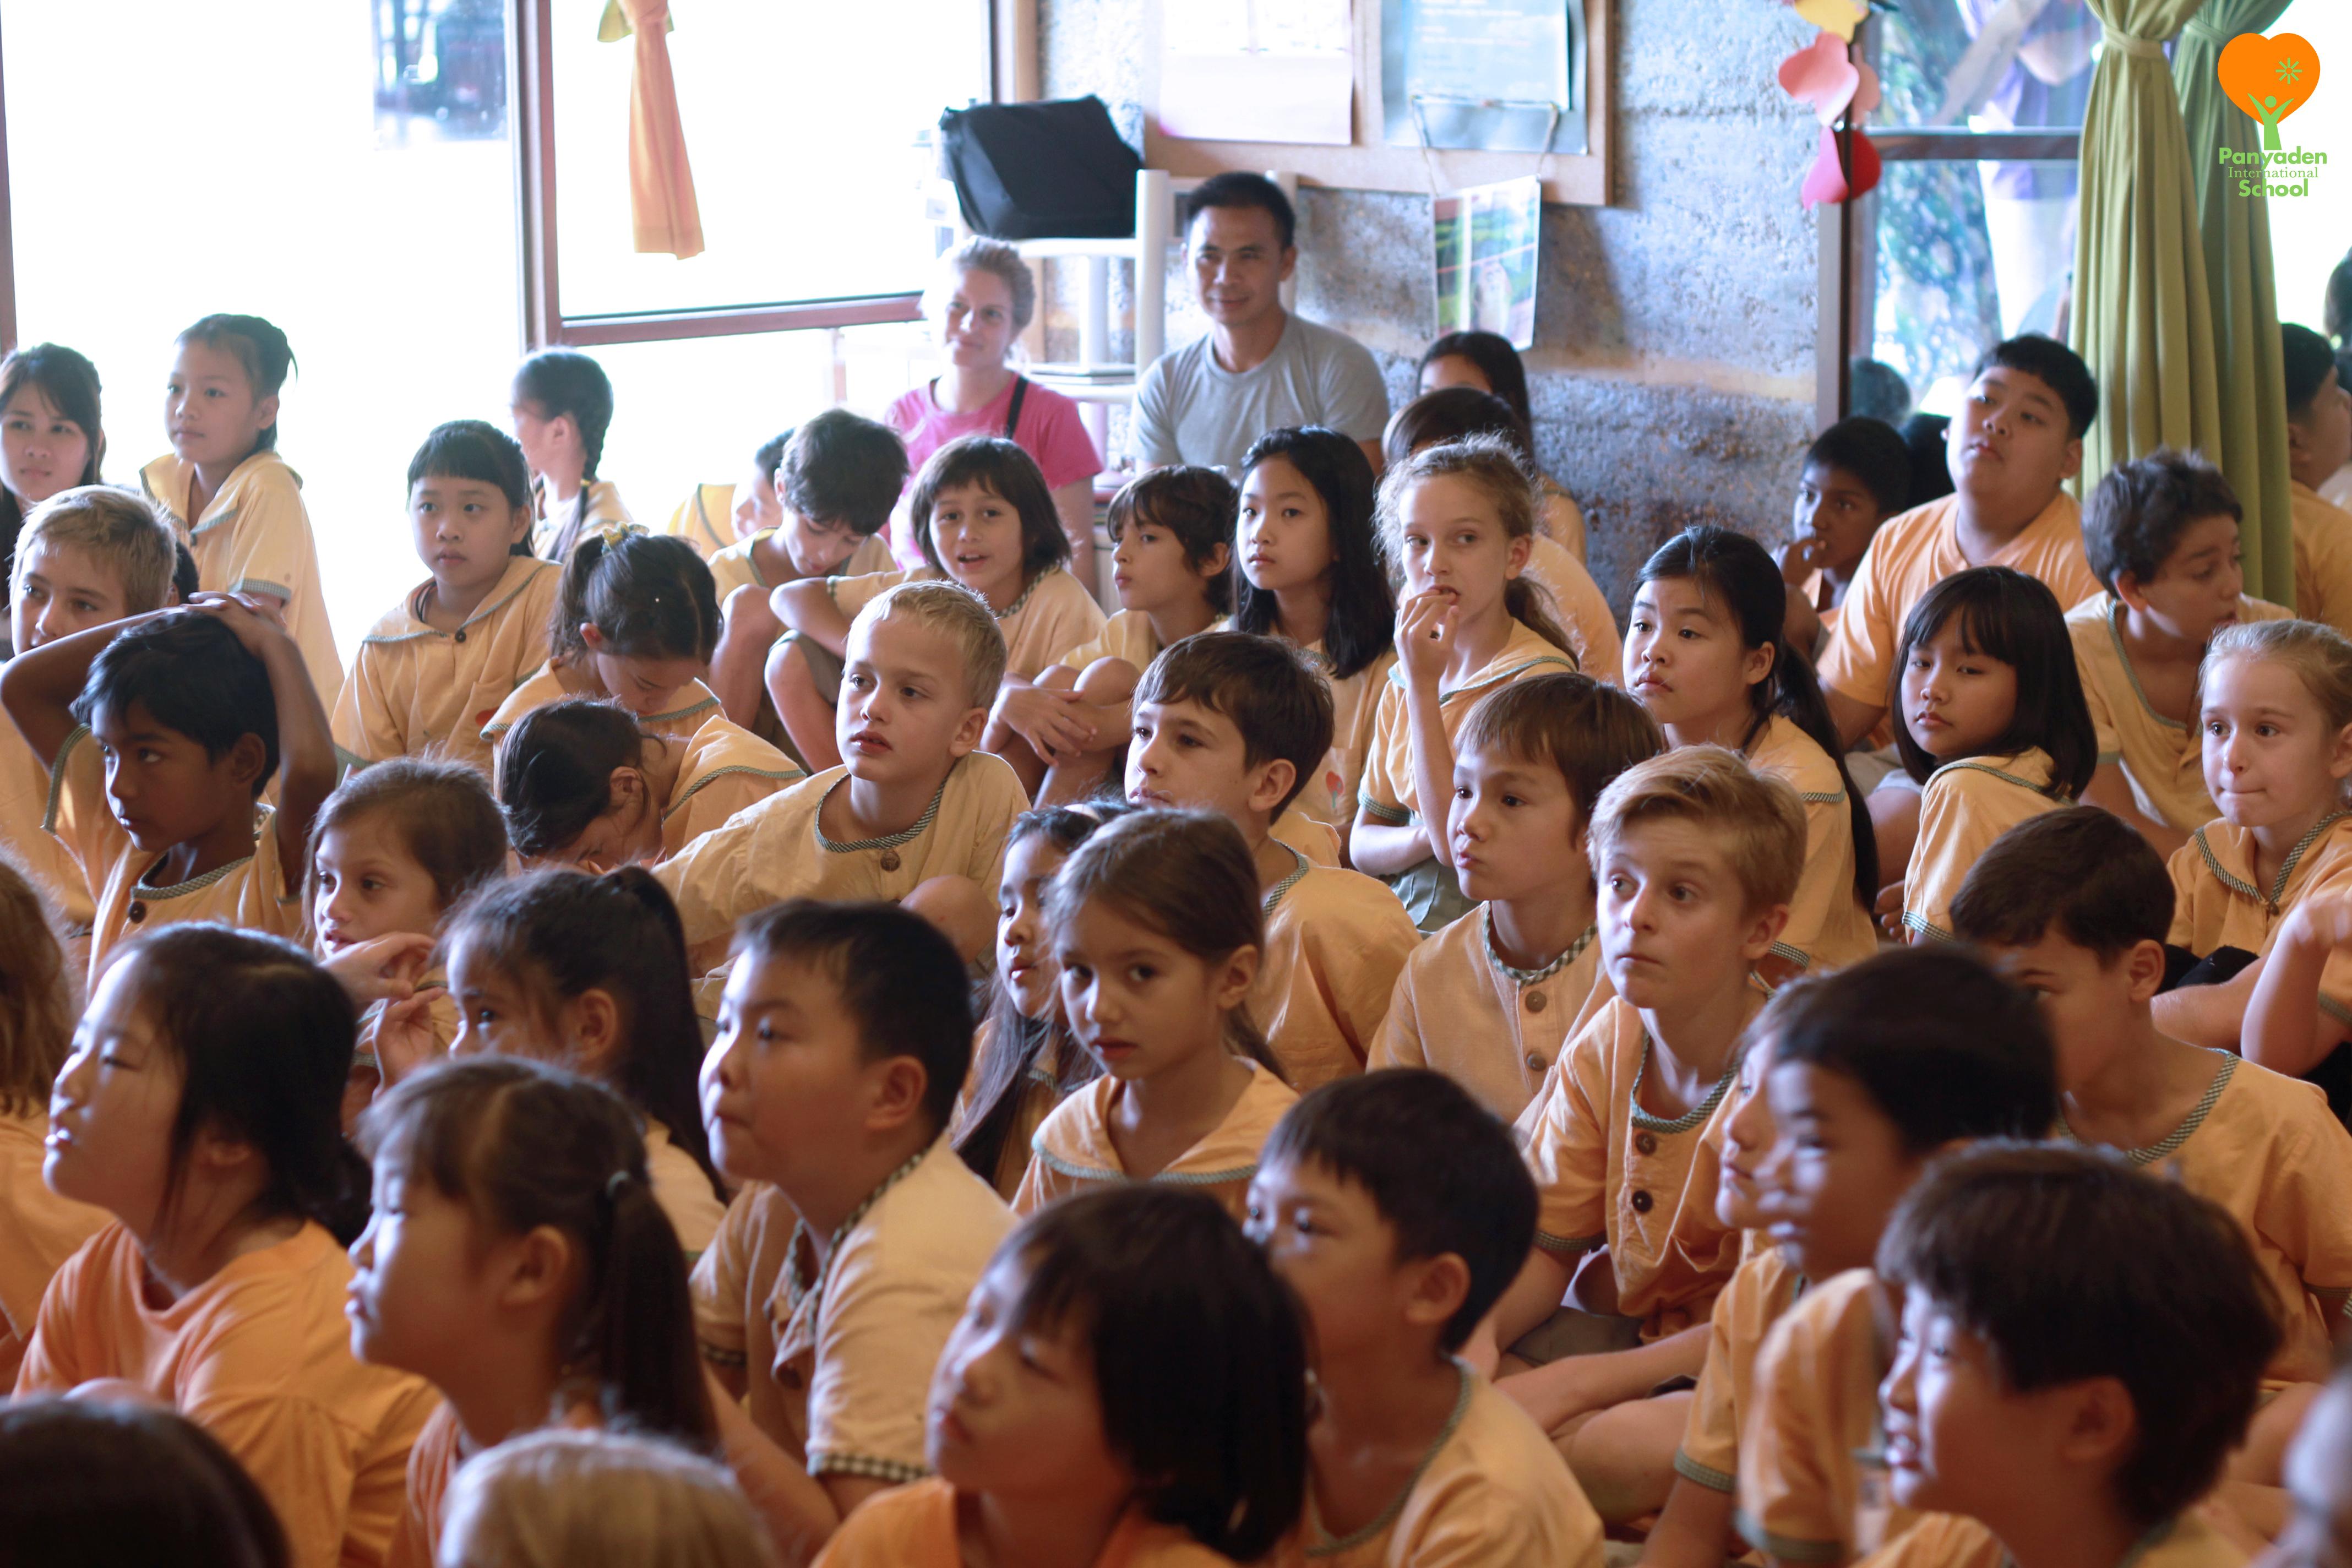 IMG_5339-logo Panyaden International School students at wise habit Avihimsa session